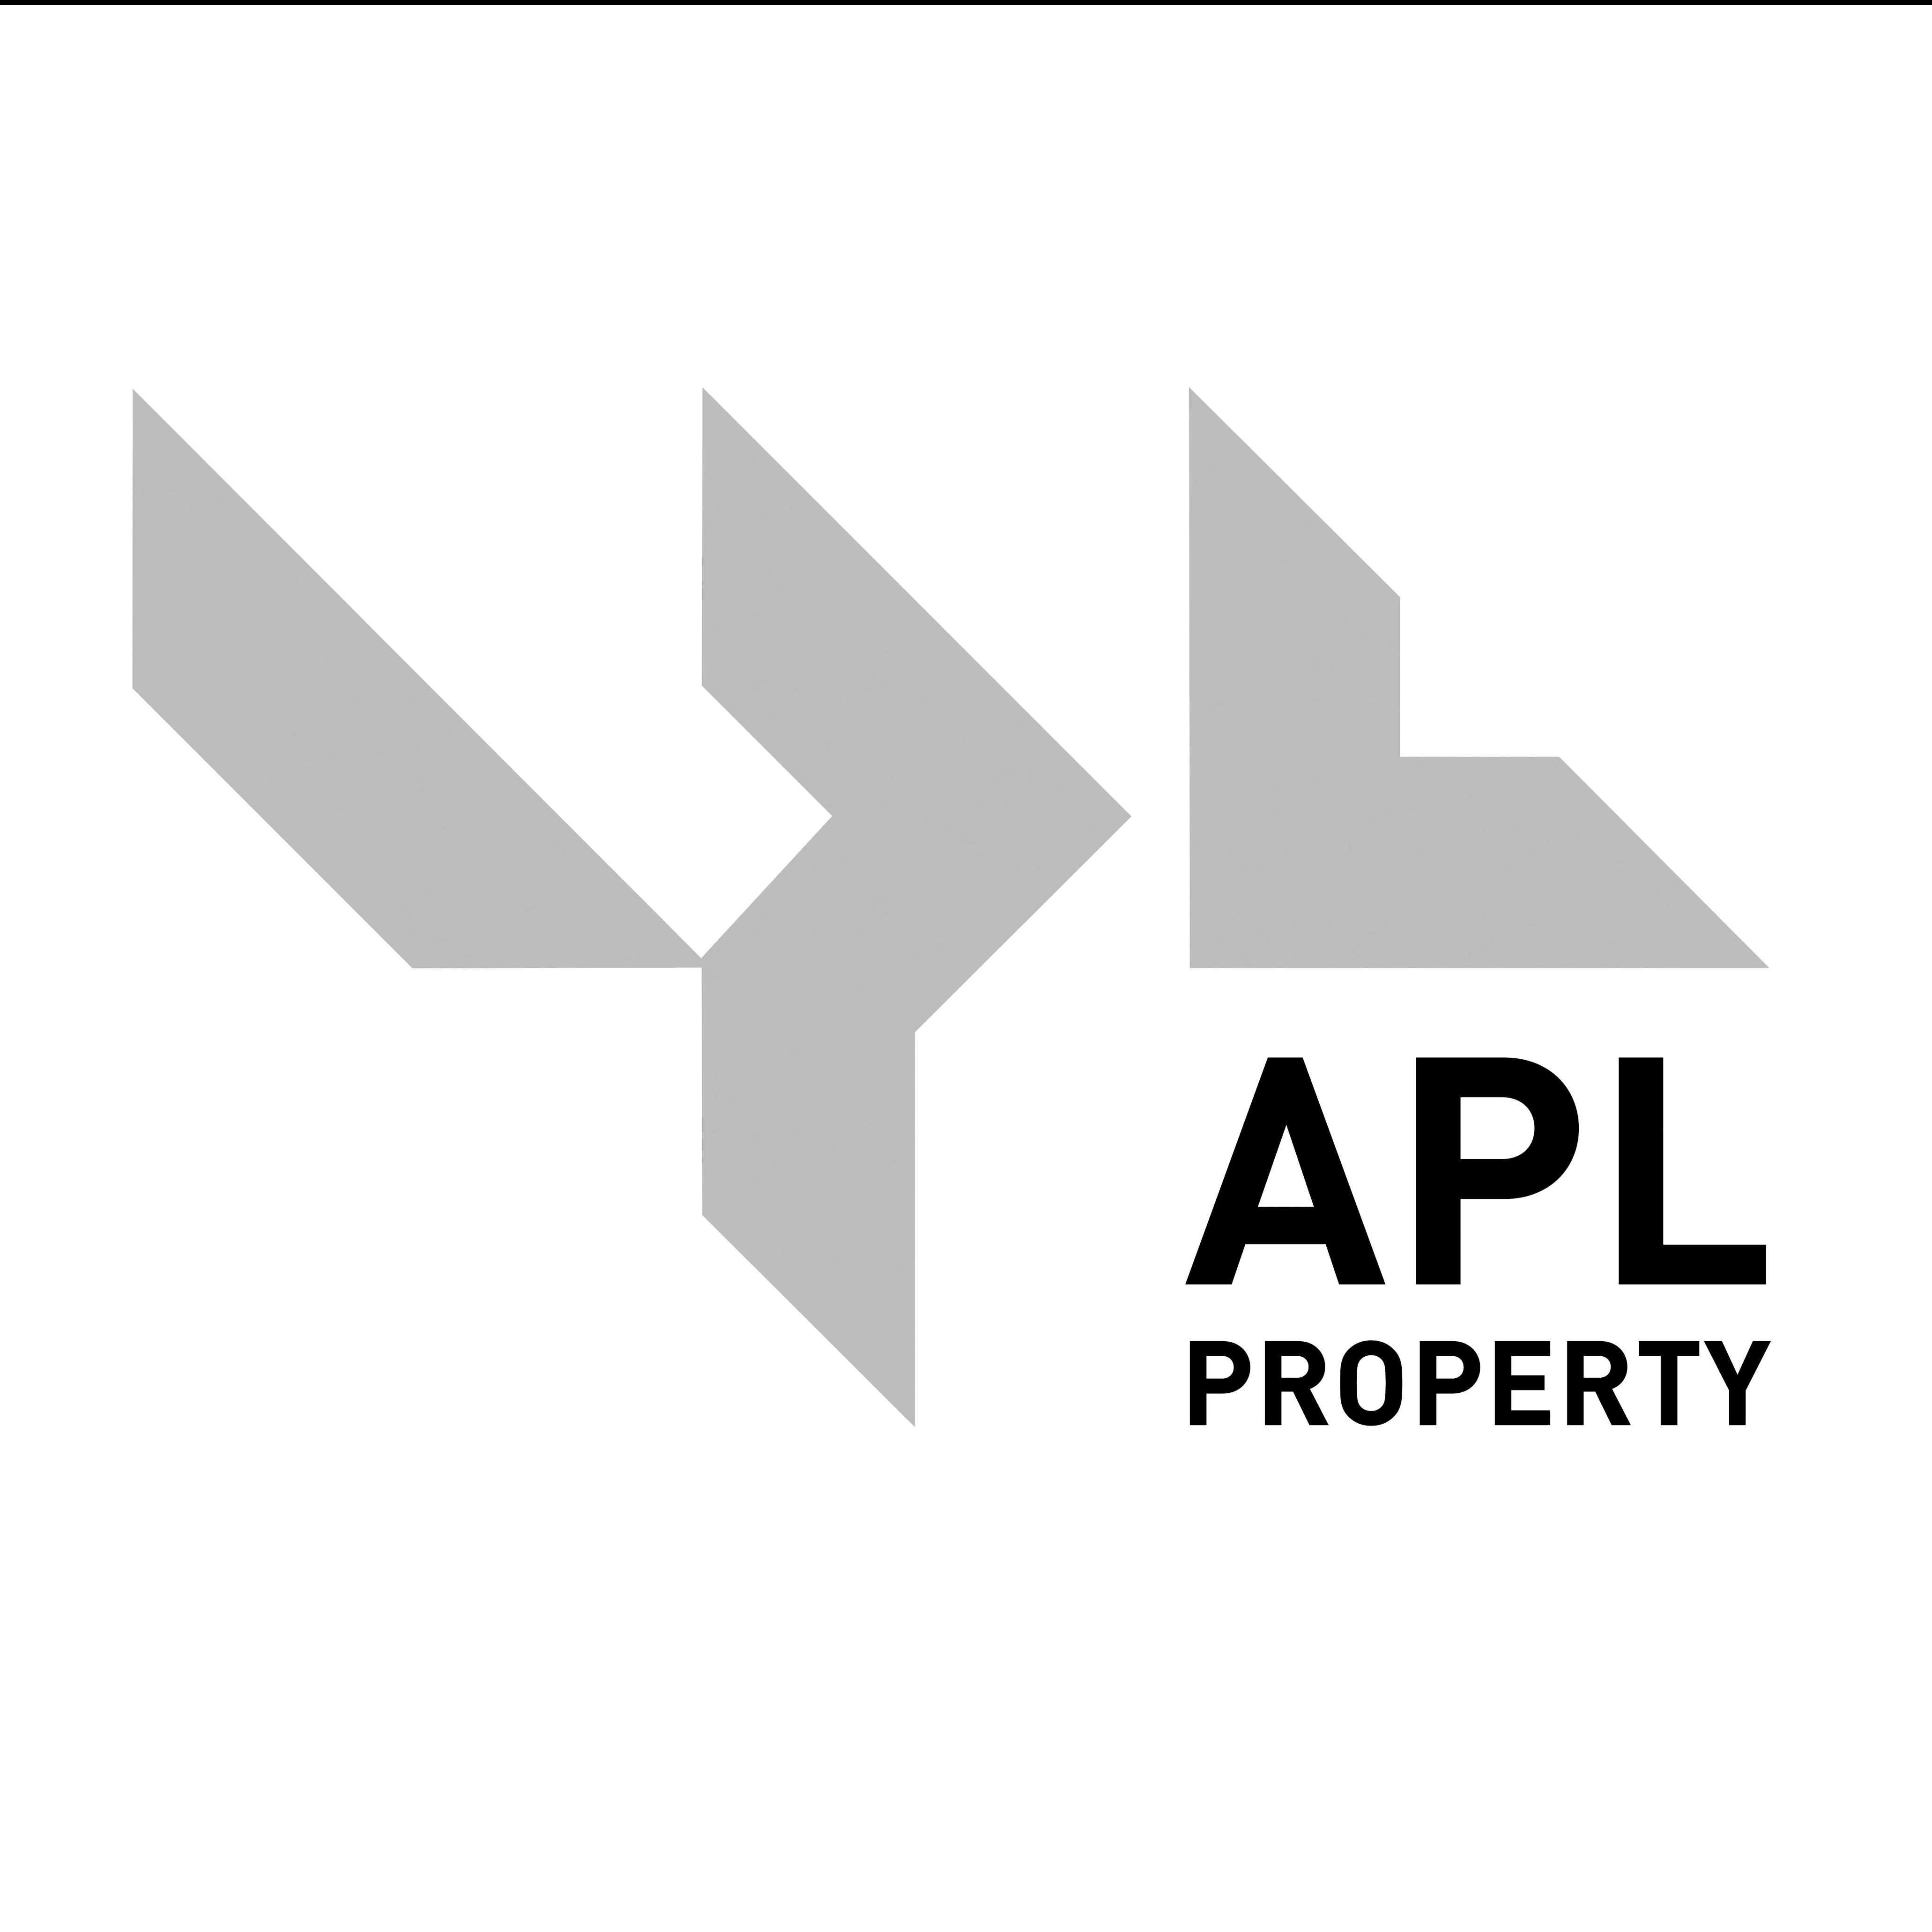 APL Property